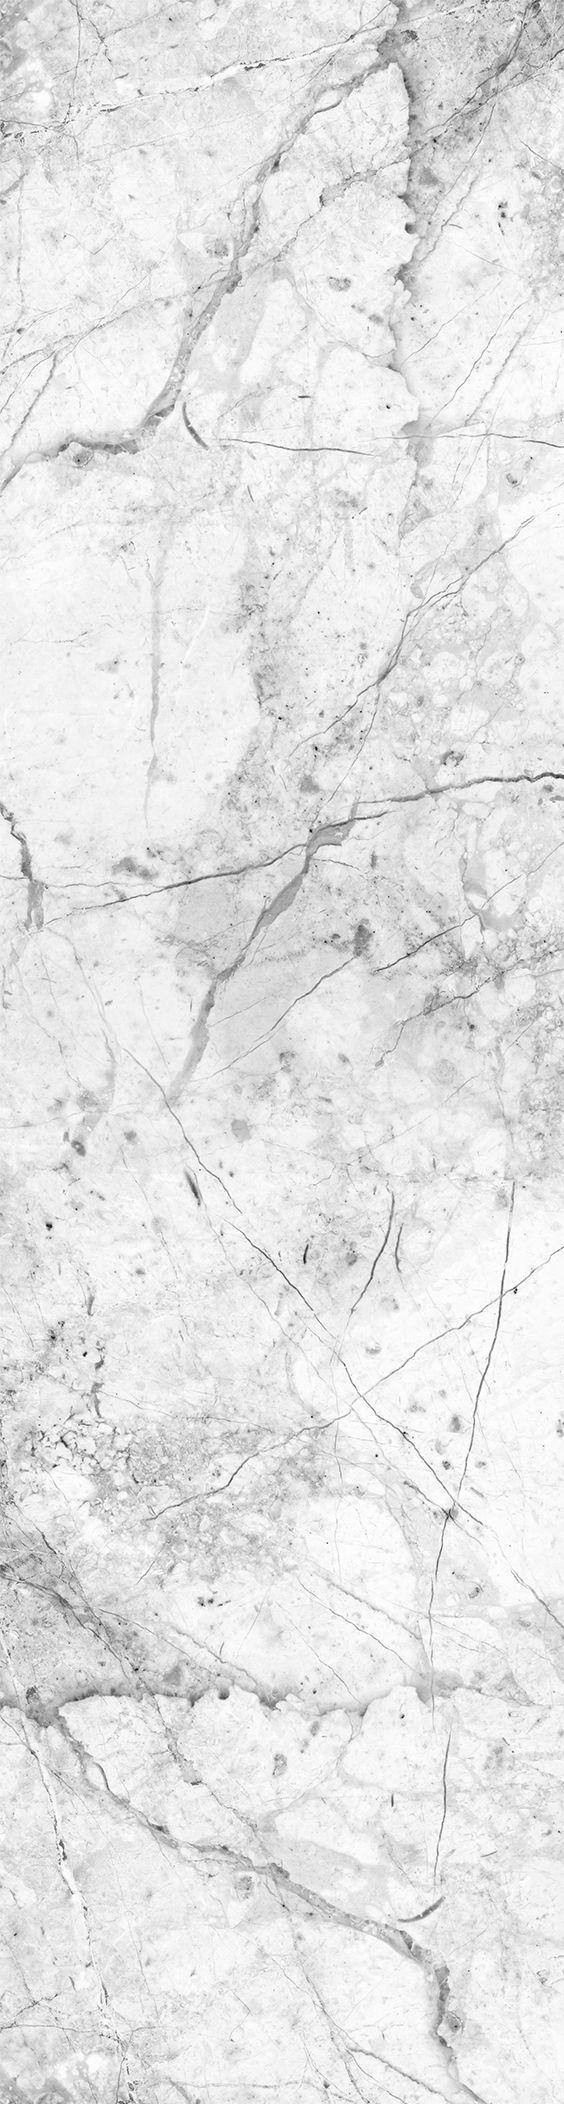 Strukturiertes Wandbild Aus Weissem Marmor Stone Texture Marble Wallpaper Textured Wallpaper